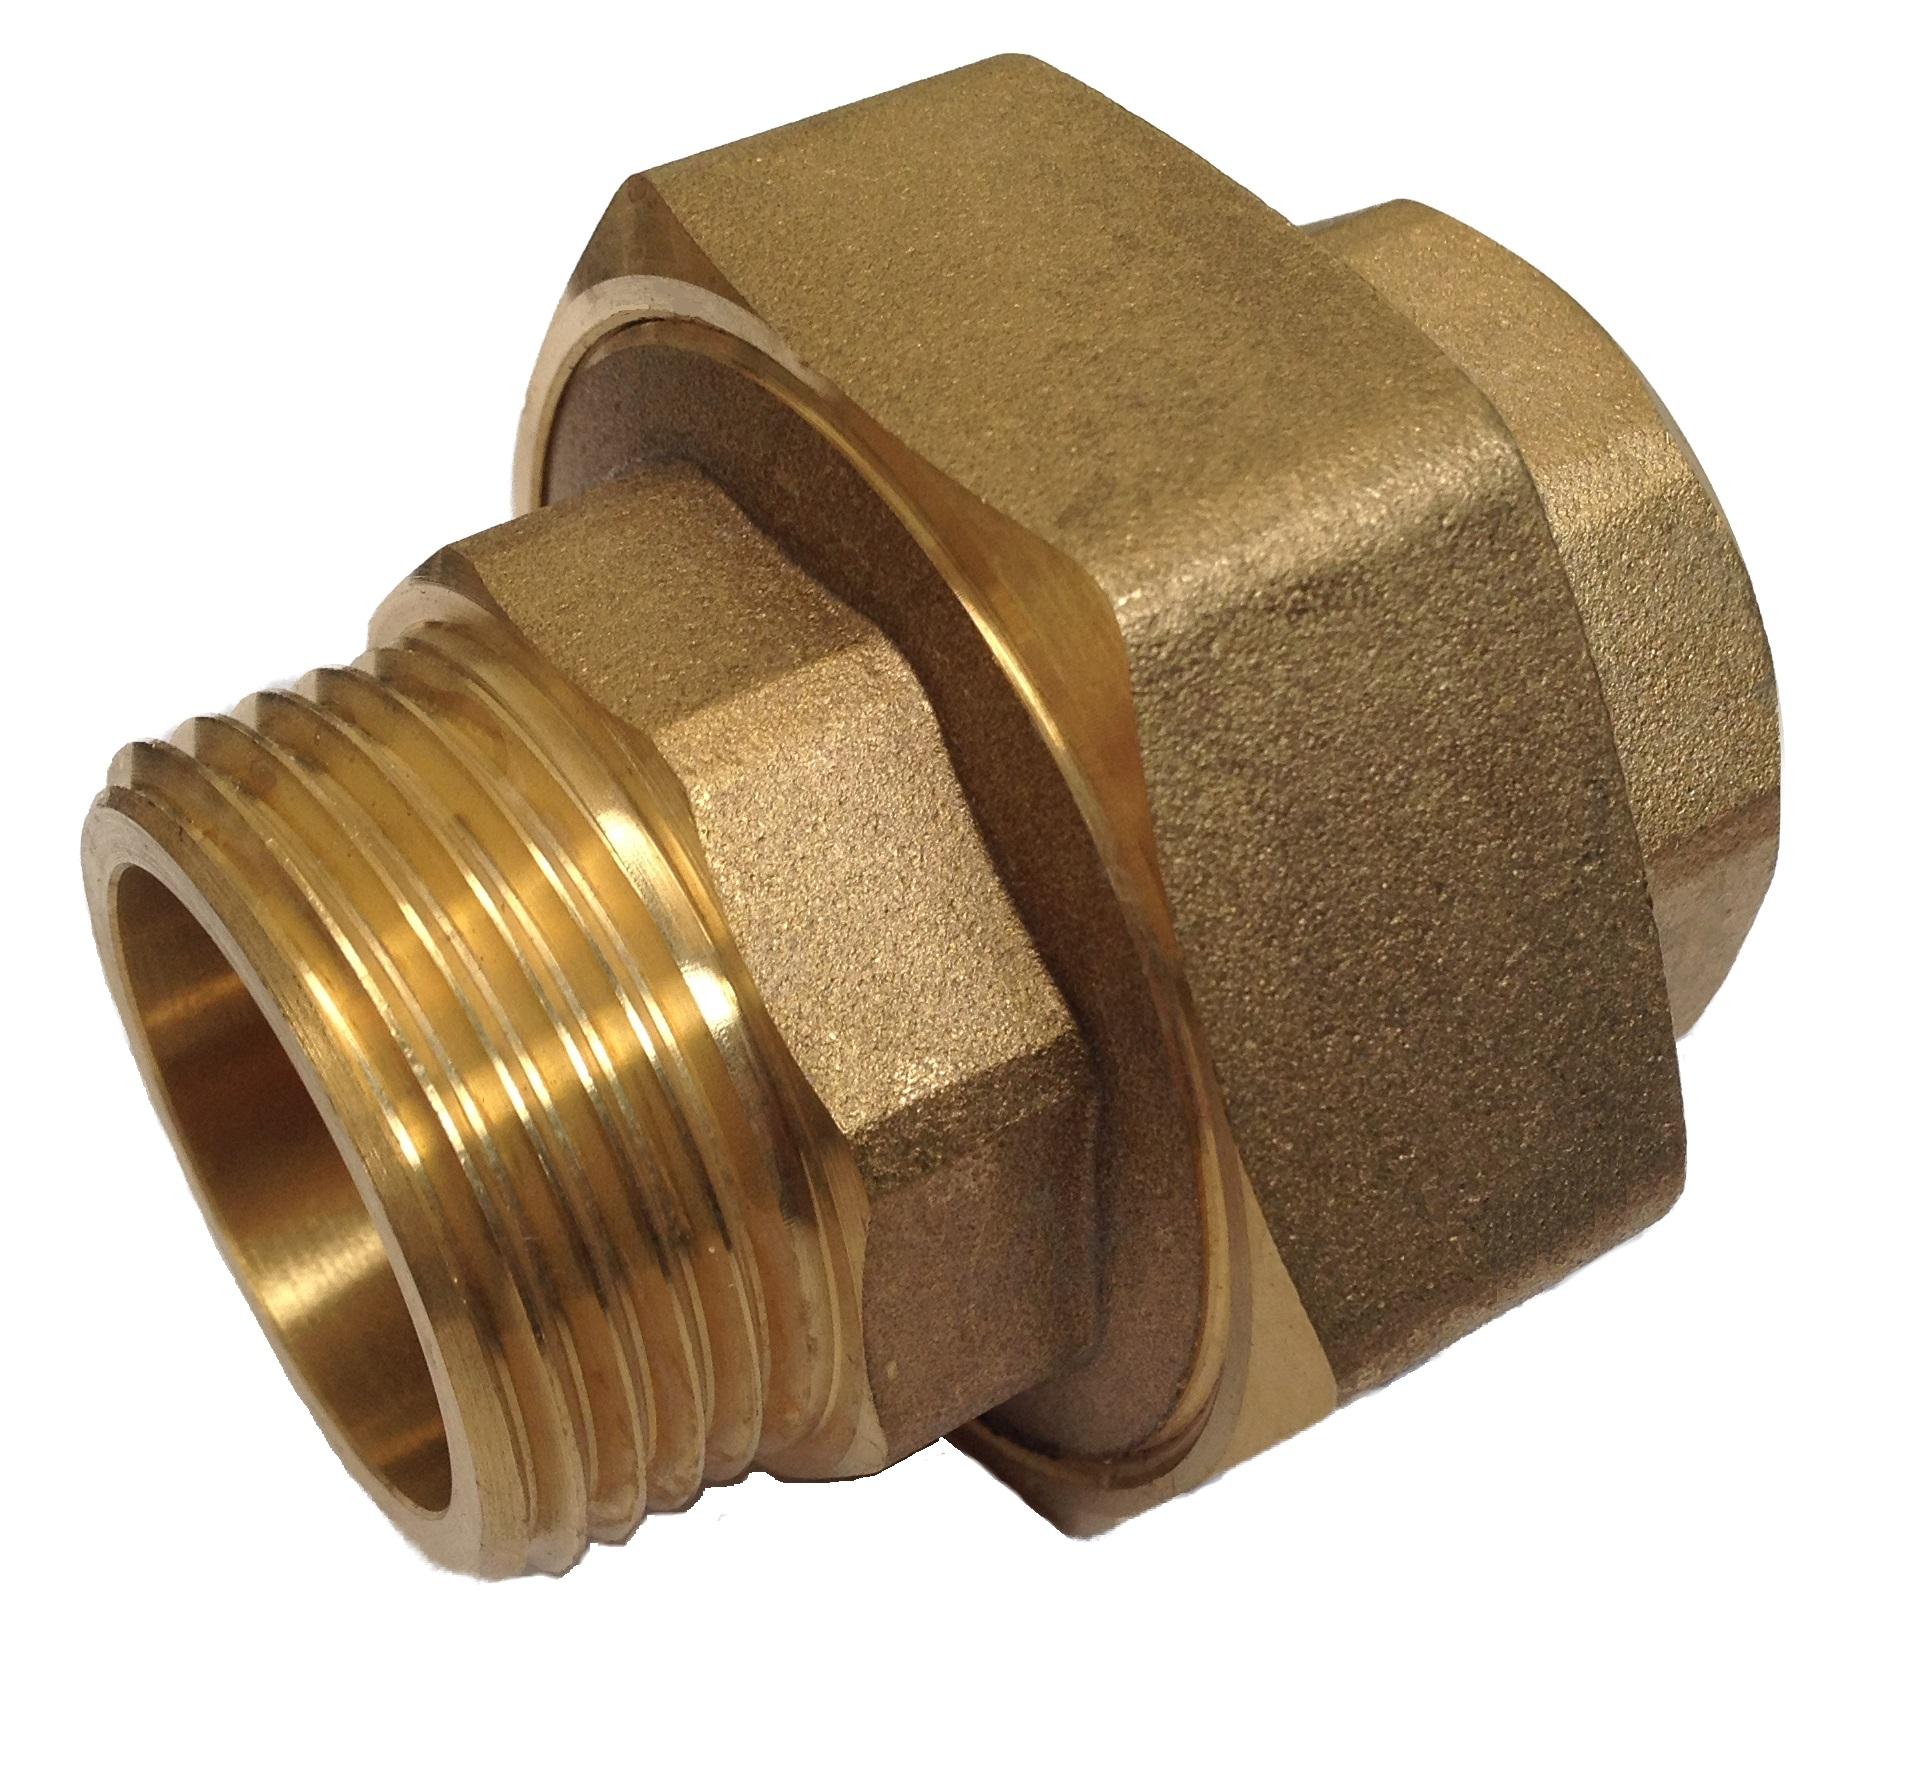 Union Brass Fitting 4/4M x 4/4F